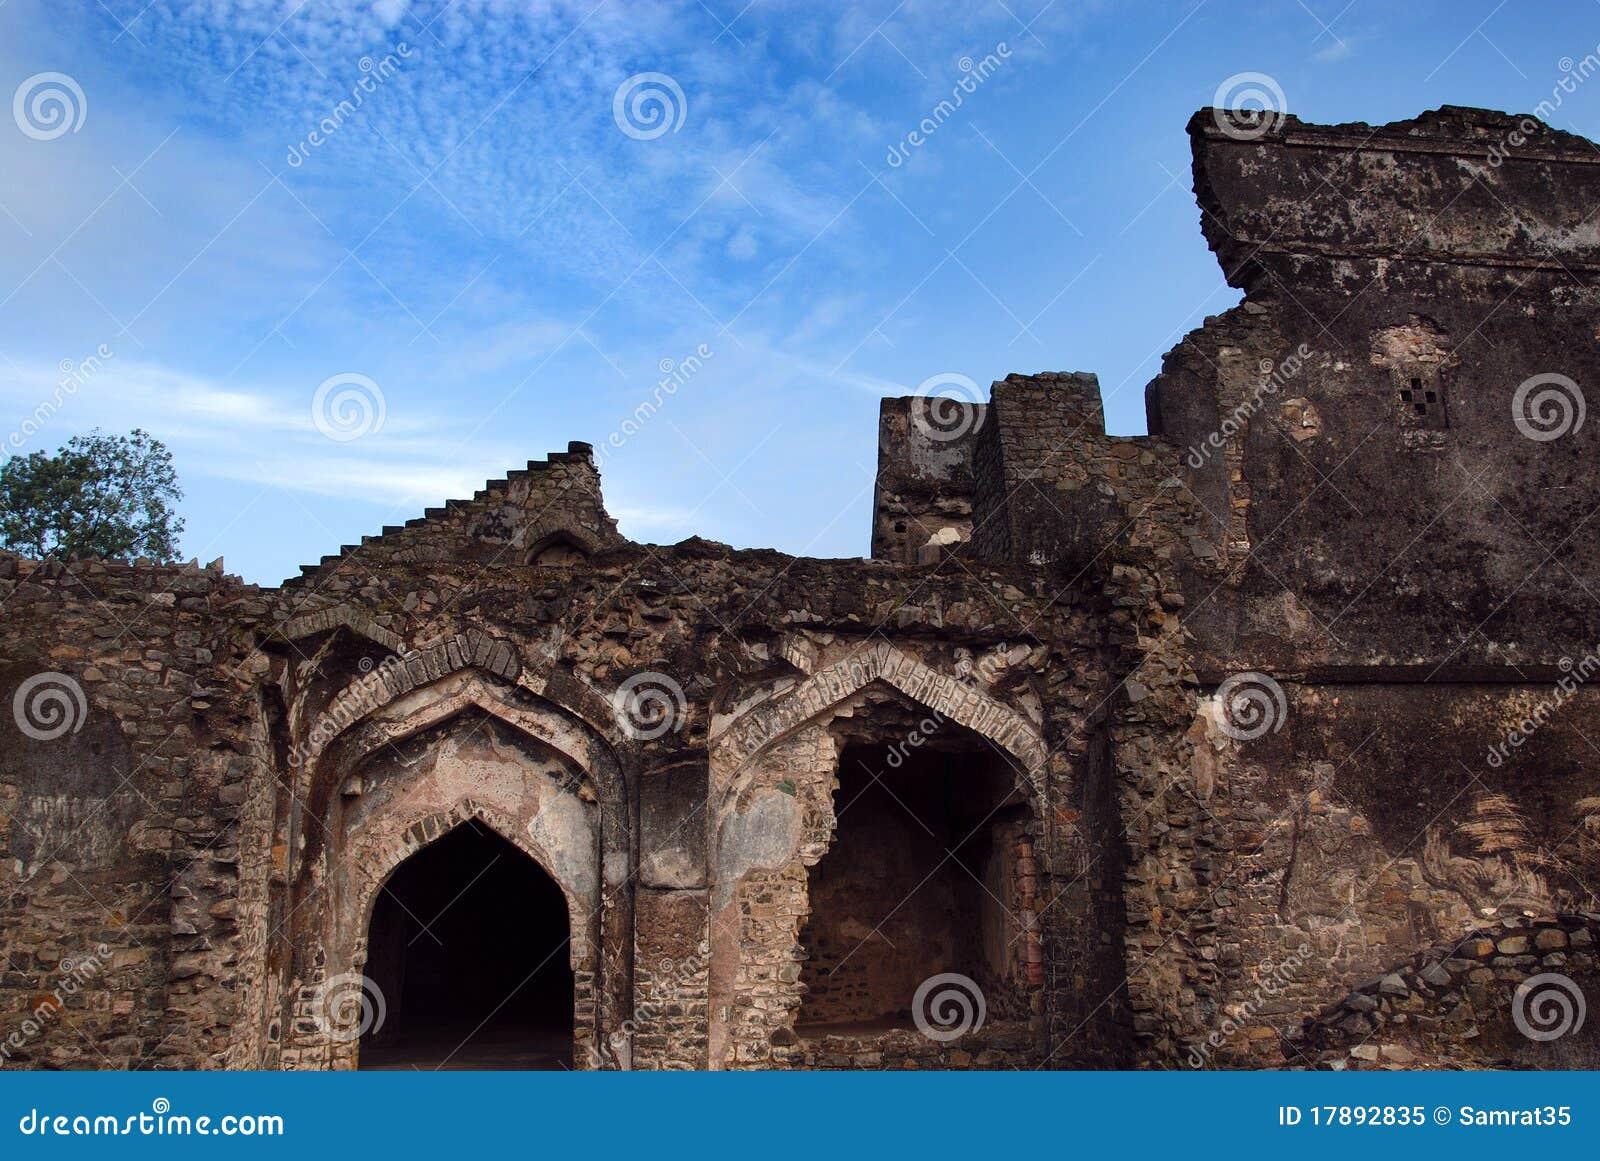 forts in ancient india Ancient india history  india's history : medieval india : shivaji - chatrapati shivaji maharaja's forts: forts pratapgad fort arnala fort janjira fort.